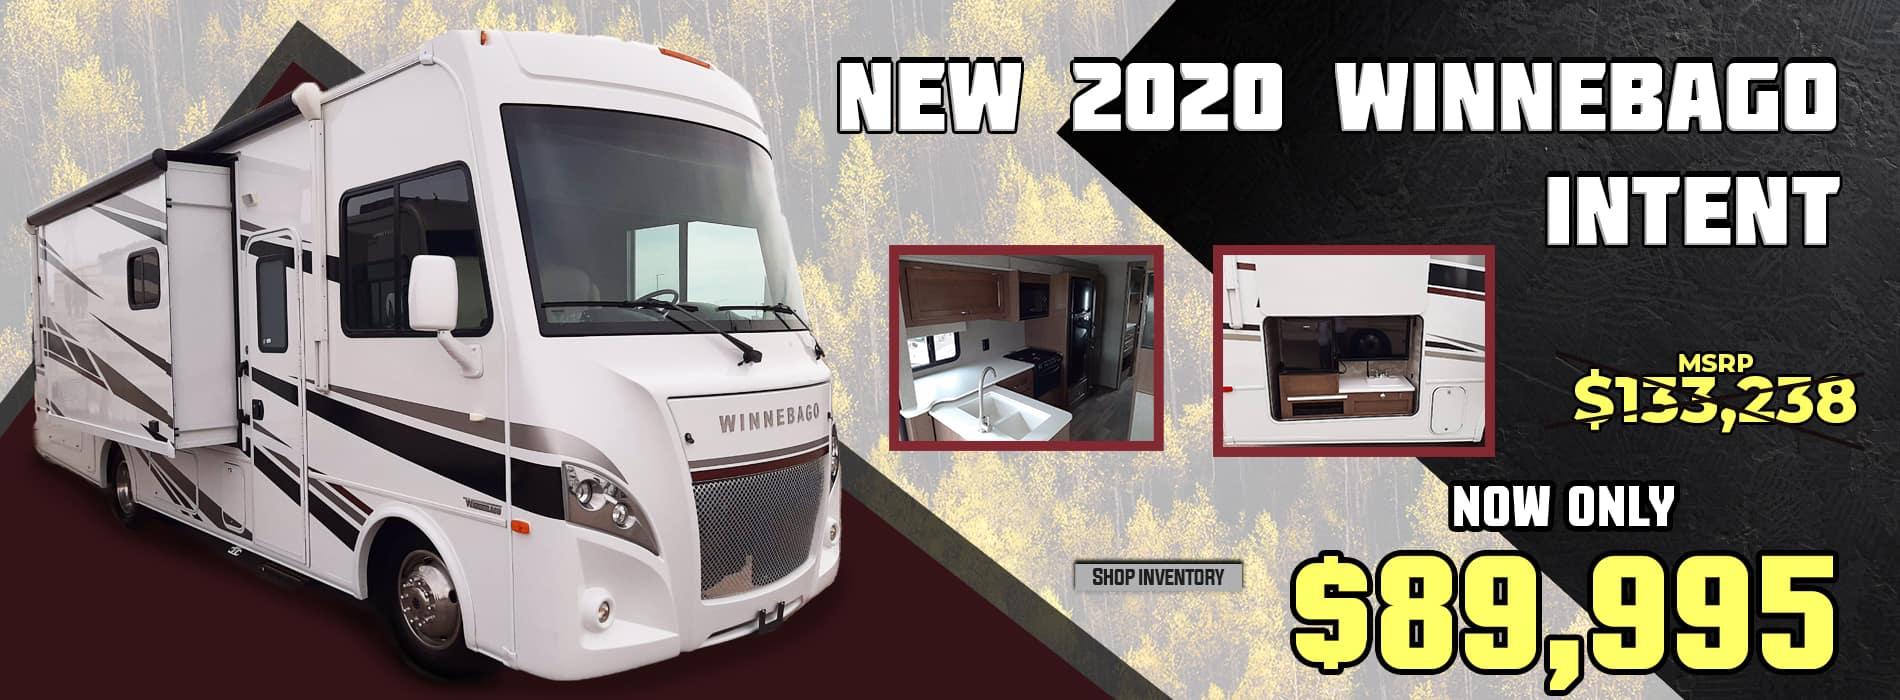 WINNEBAGO INTENT SEPT 2020